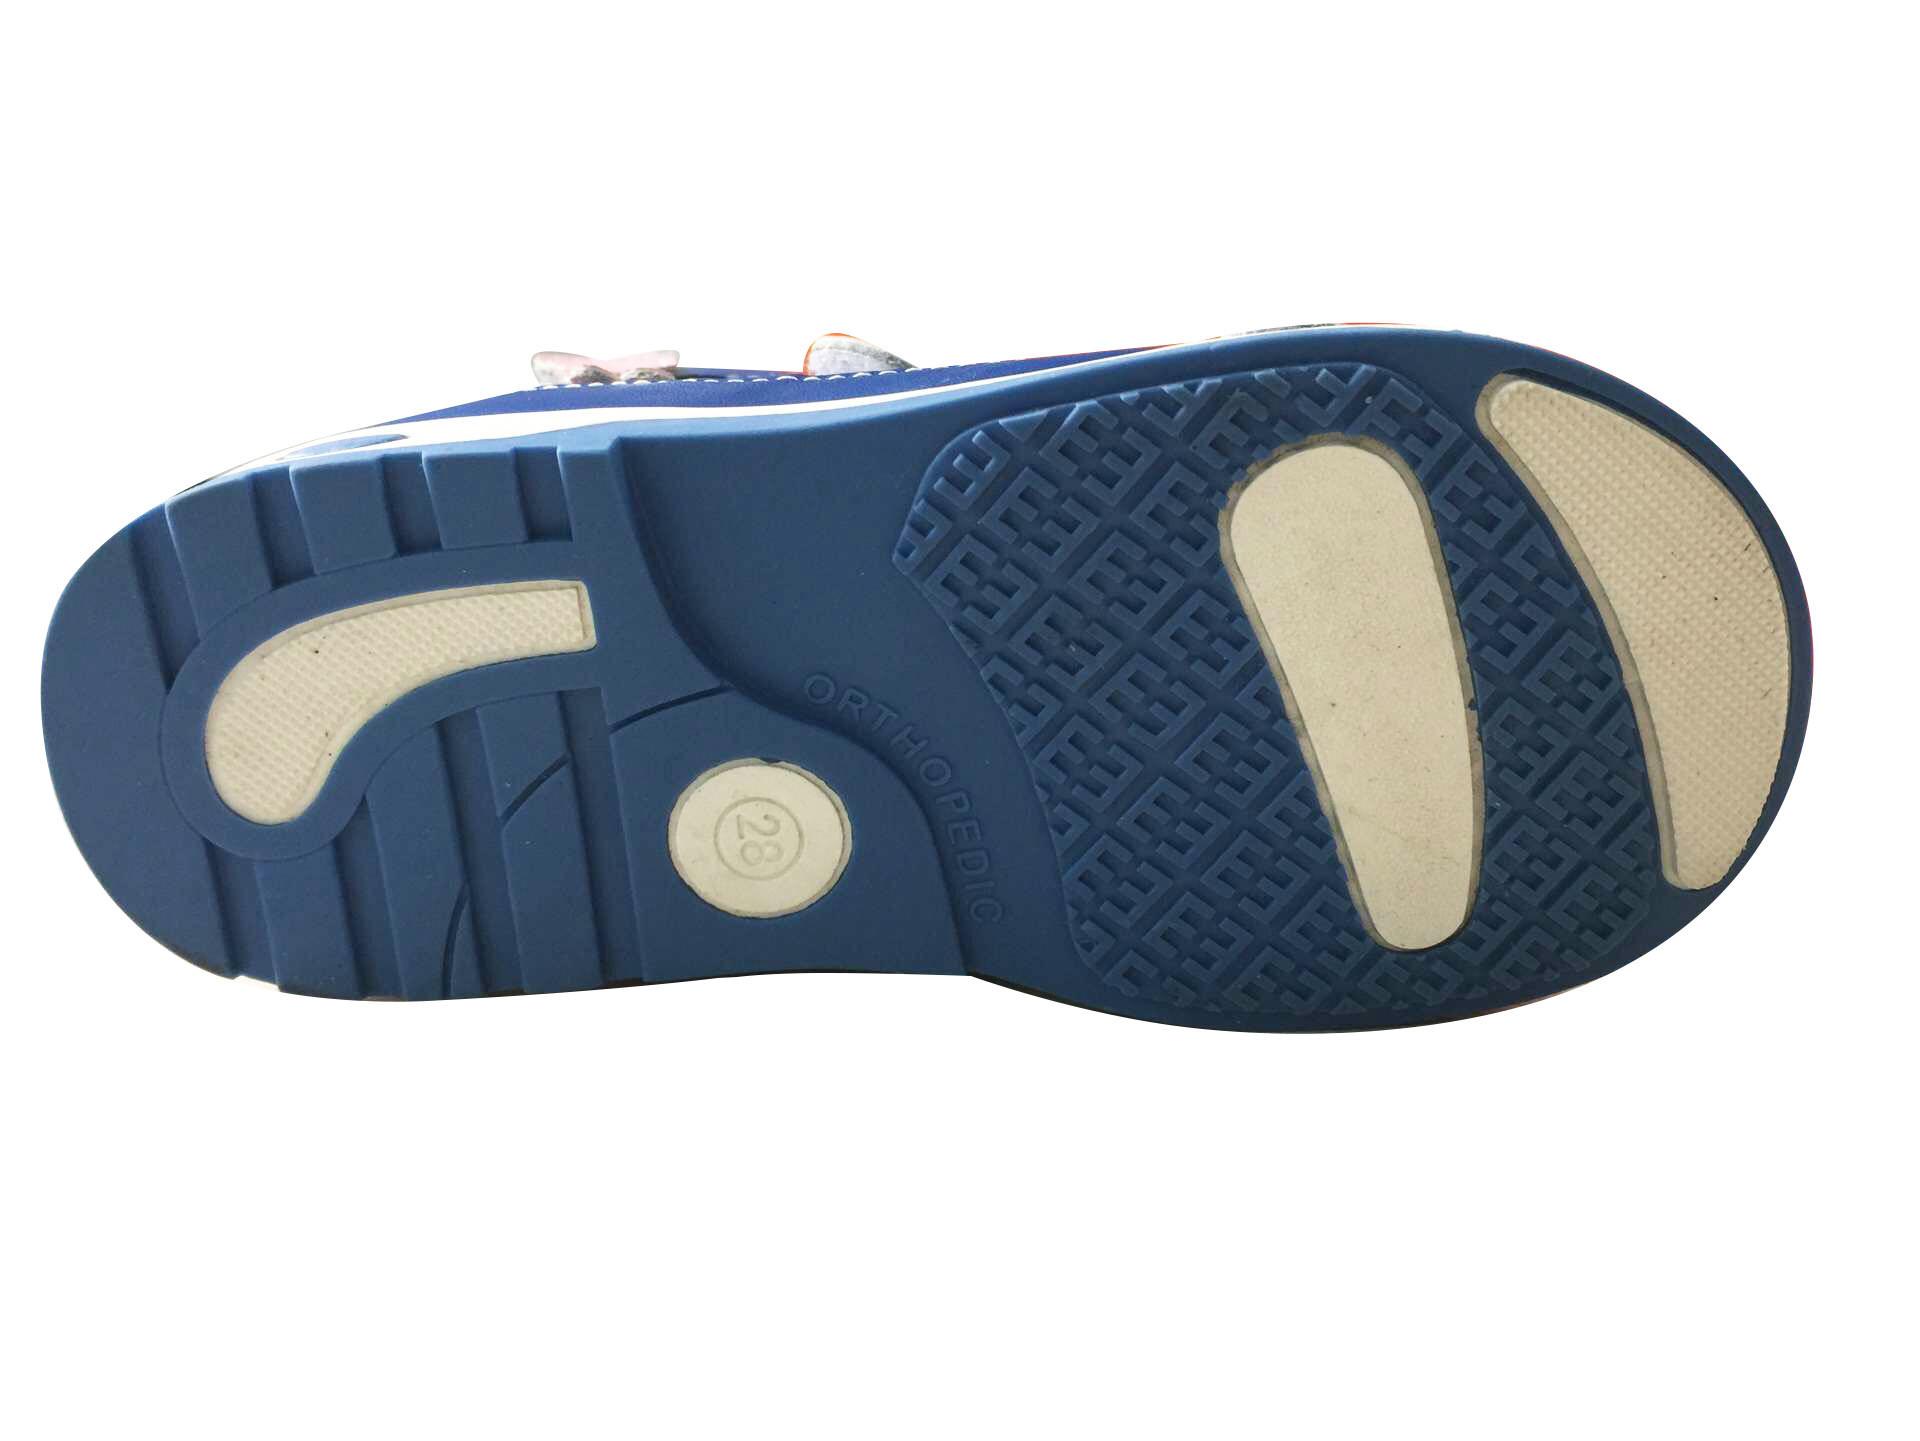 Health Sweet Shoes Casual Sandal for Girl′s Sandal